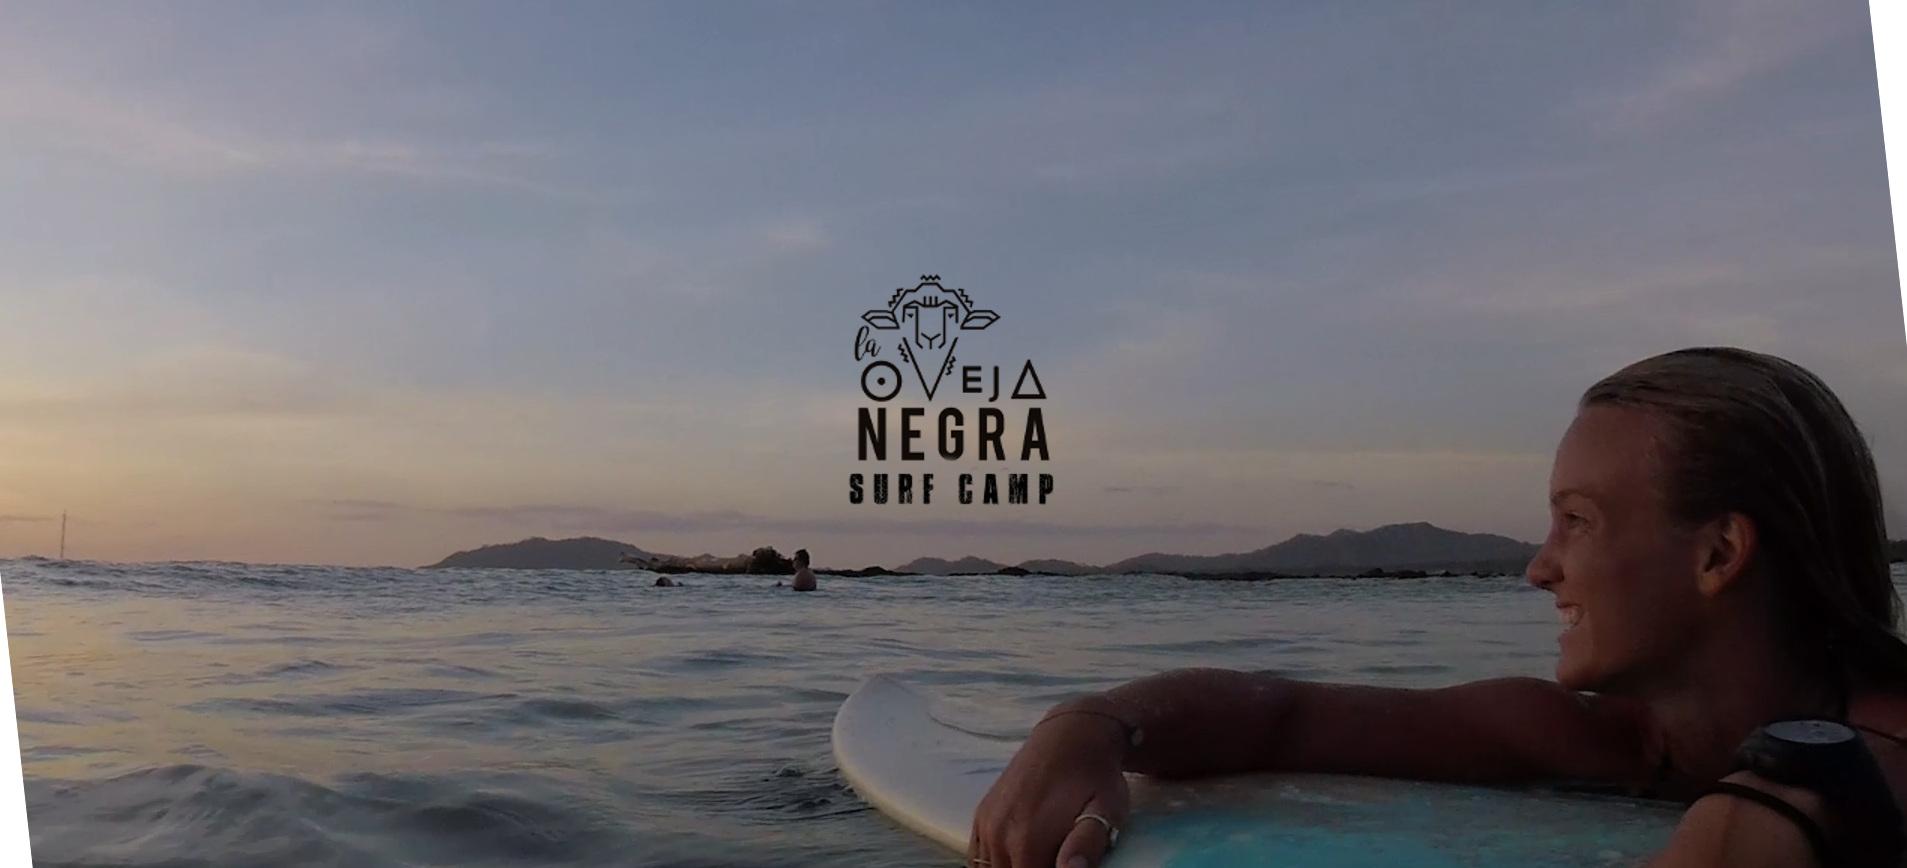 Tamarindo Surf Lesson Camp Costa Rica - La Oveja Negra 22